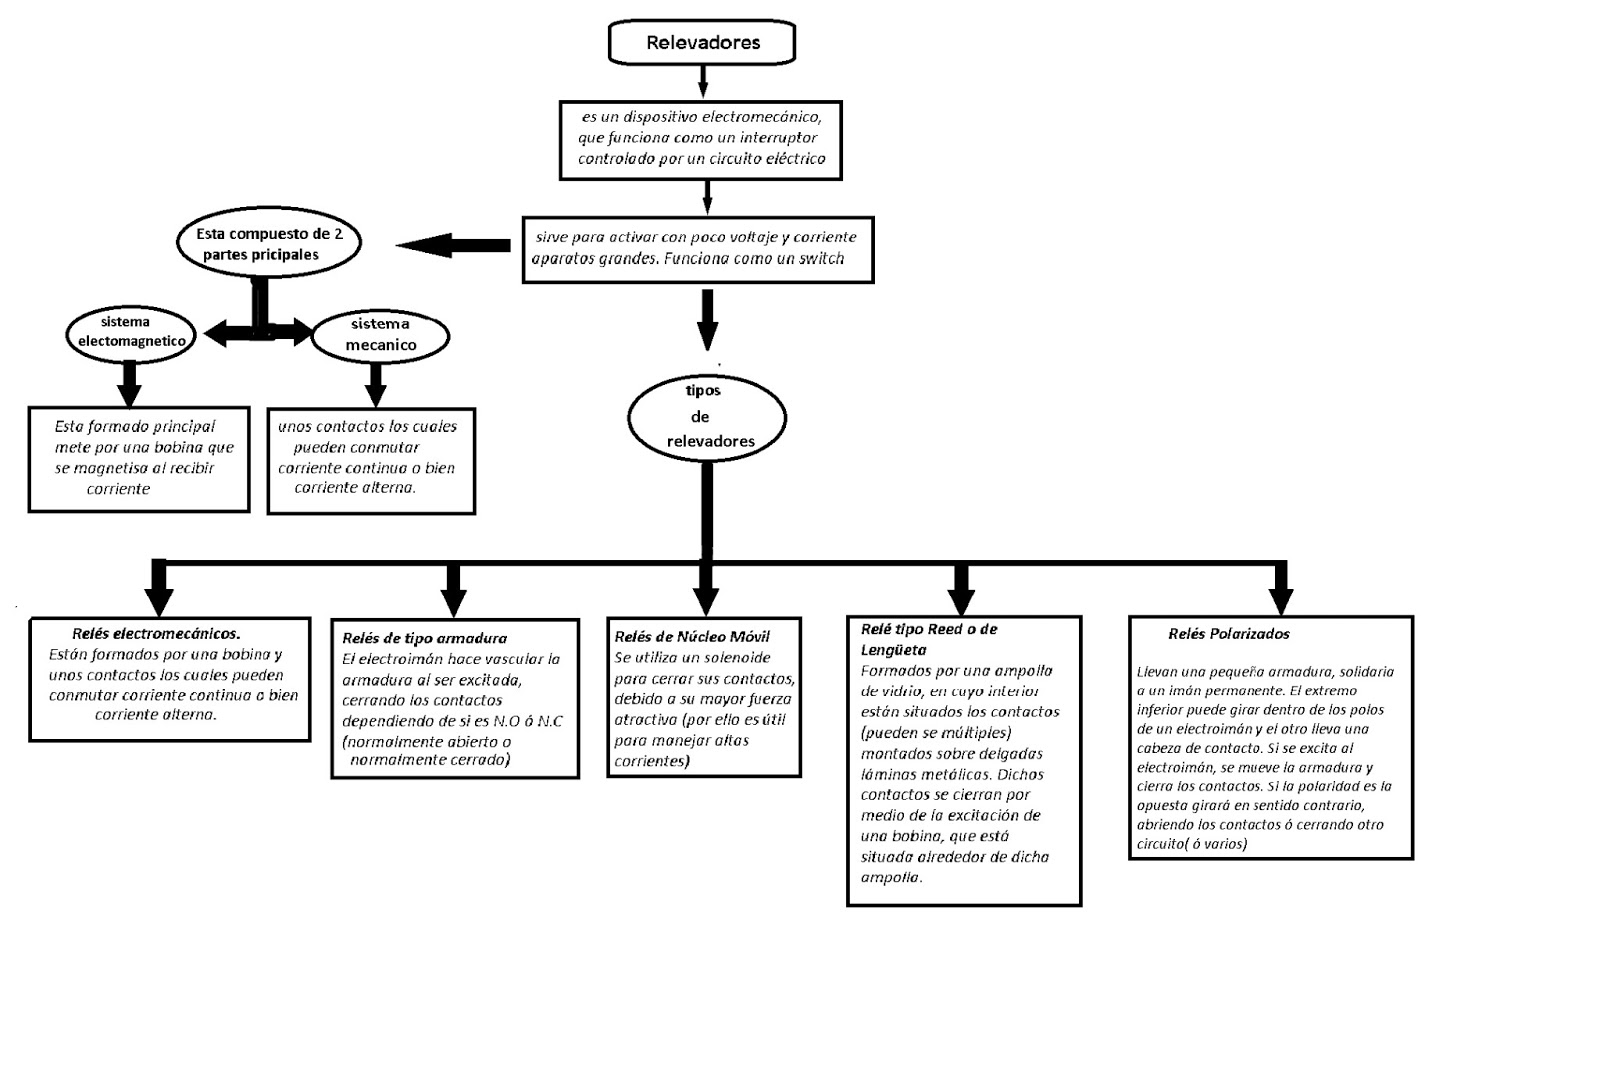 medium resolution of controlado de video juego auto electrical wiring diagram version namesingleledschematicjpg views12 size106 kb id837